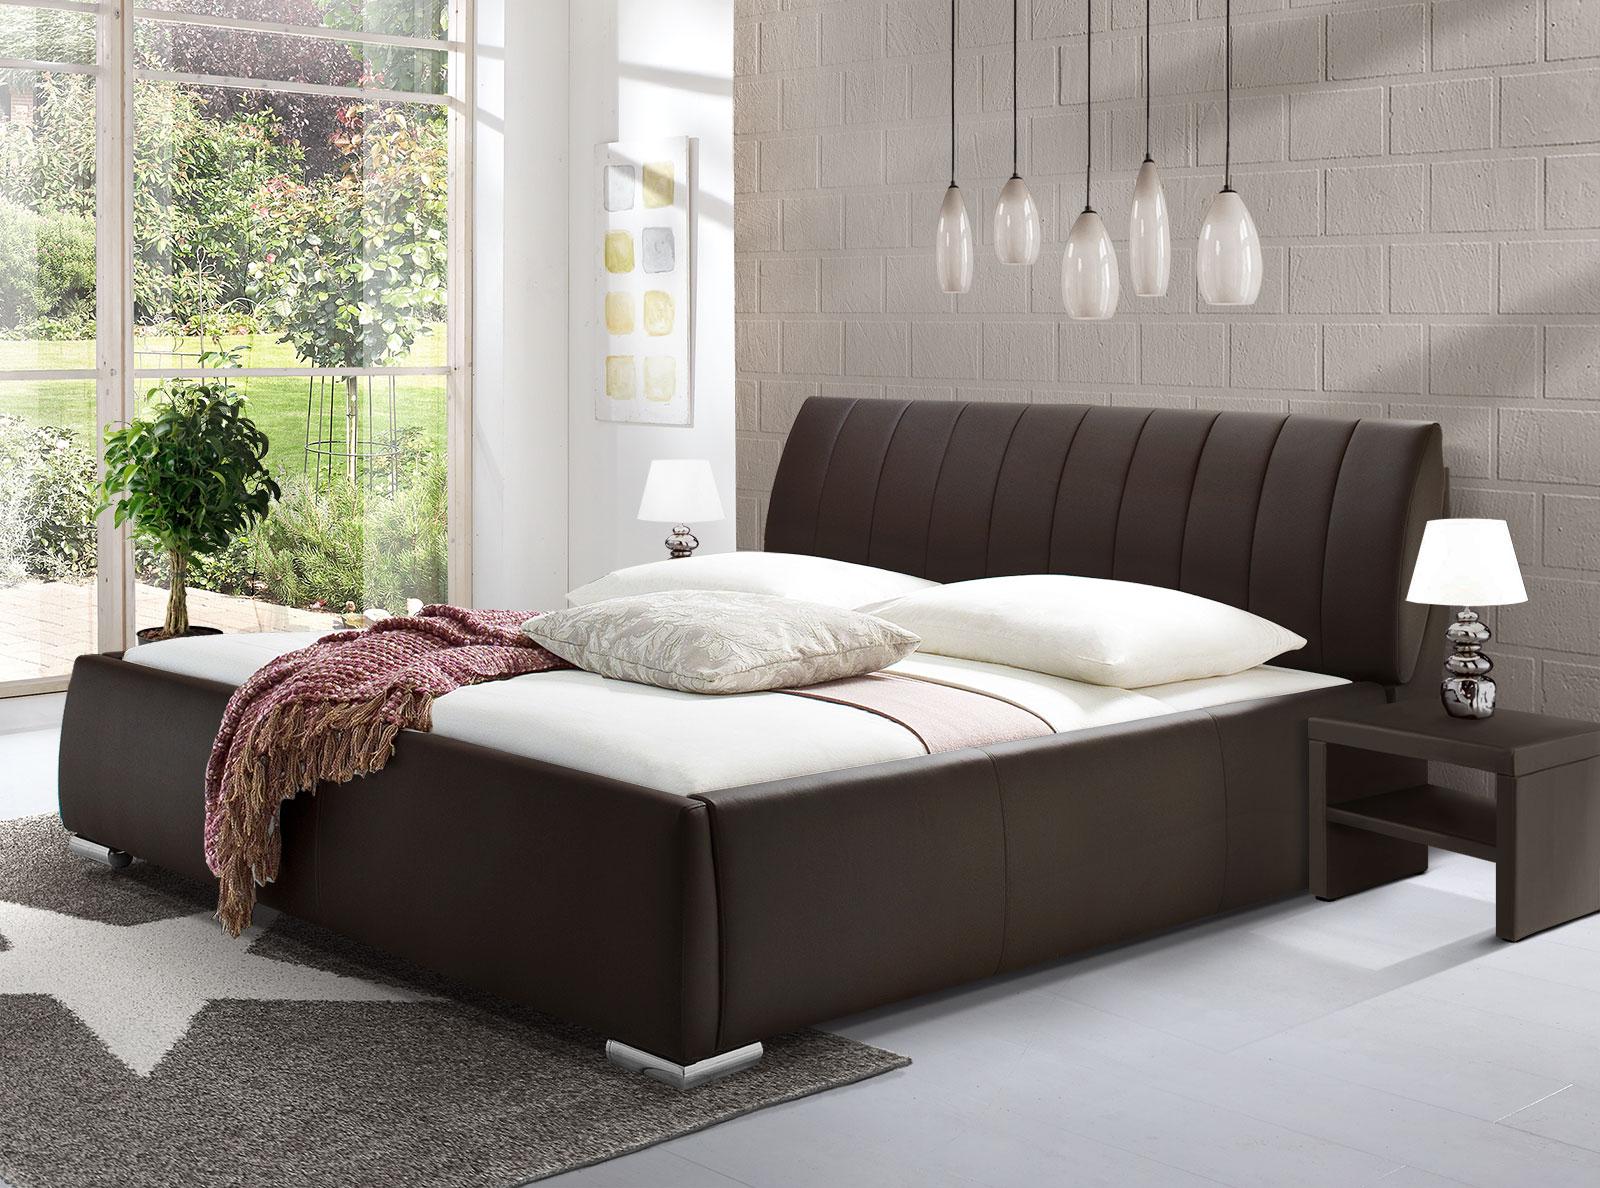 Kunstlederbett mit Bettkasten und Lattenrost - Lewdown